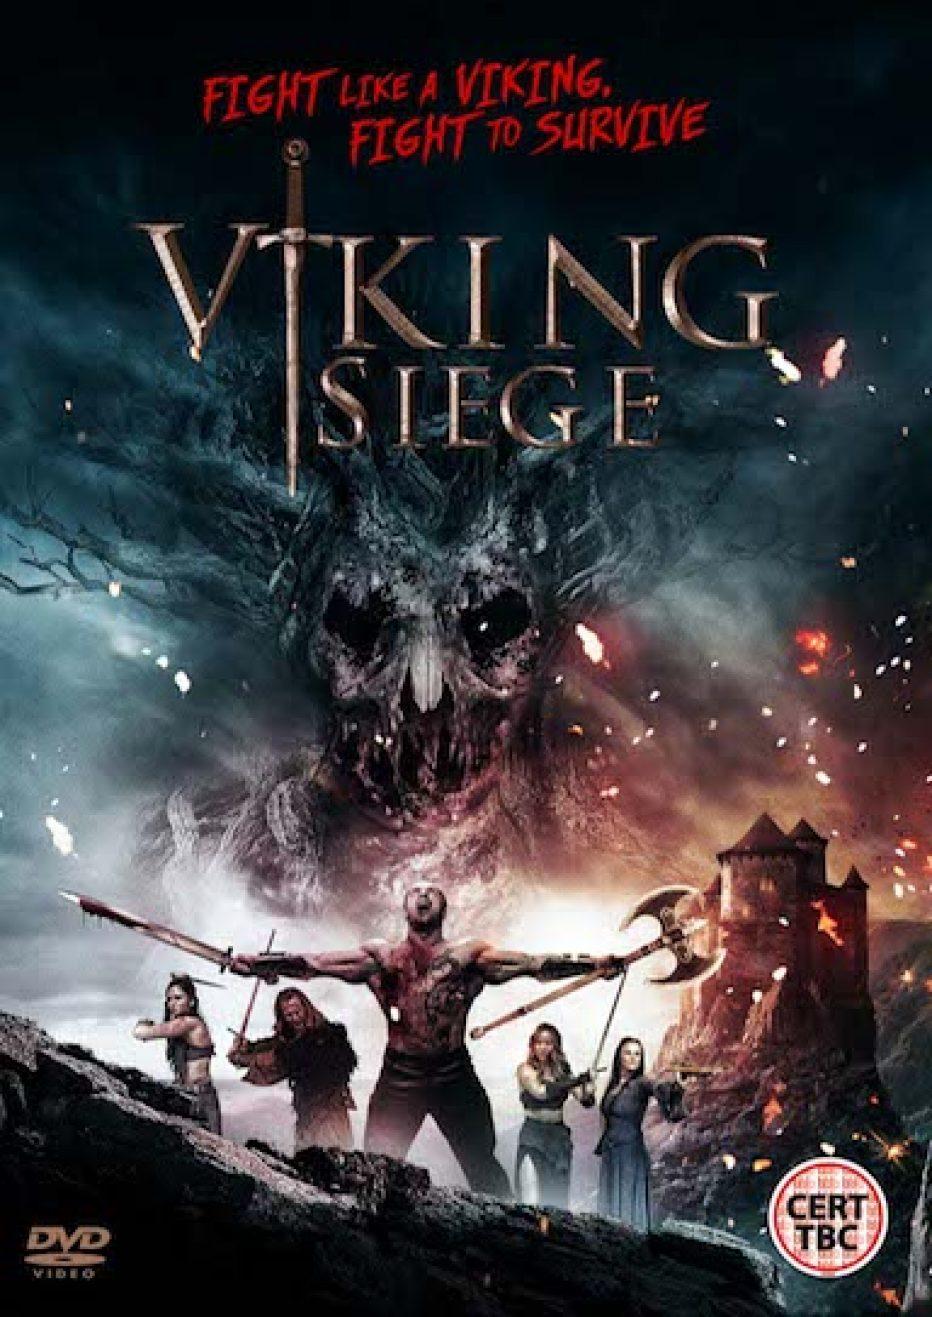 Viking Siege (2017) Review